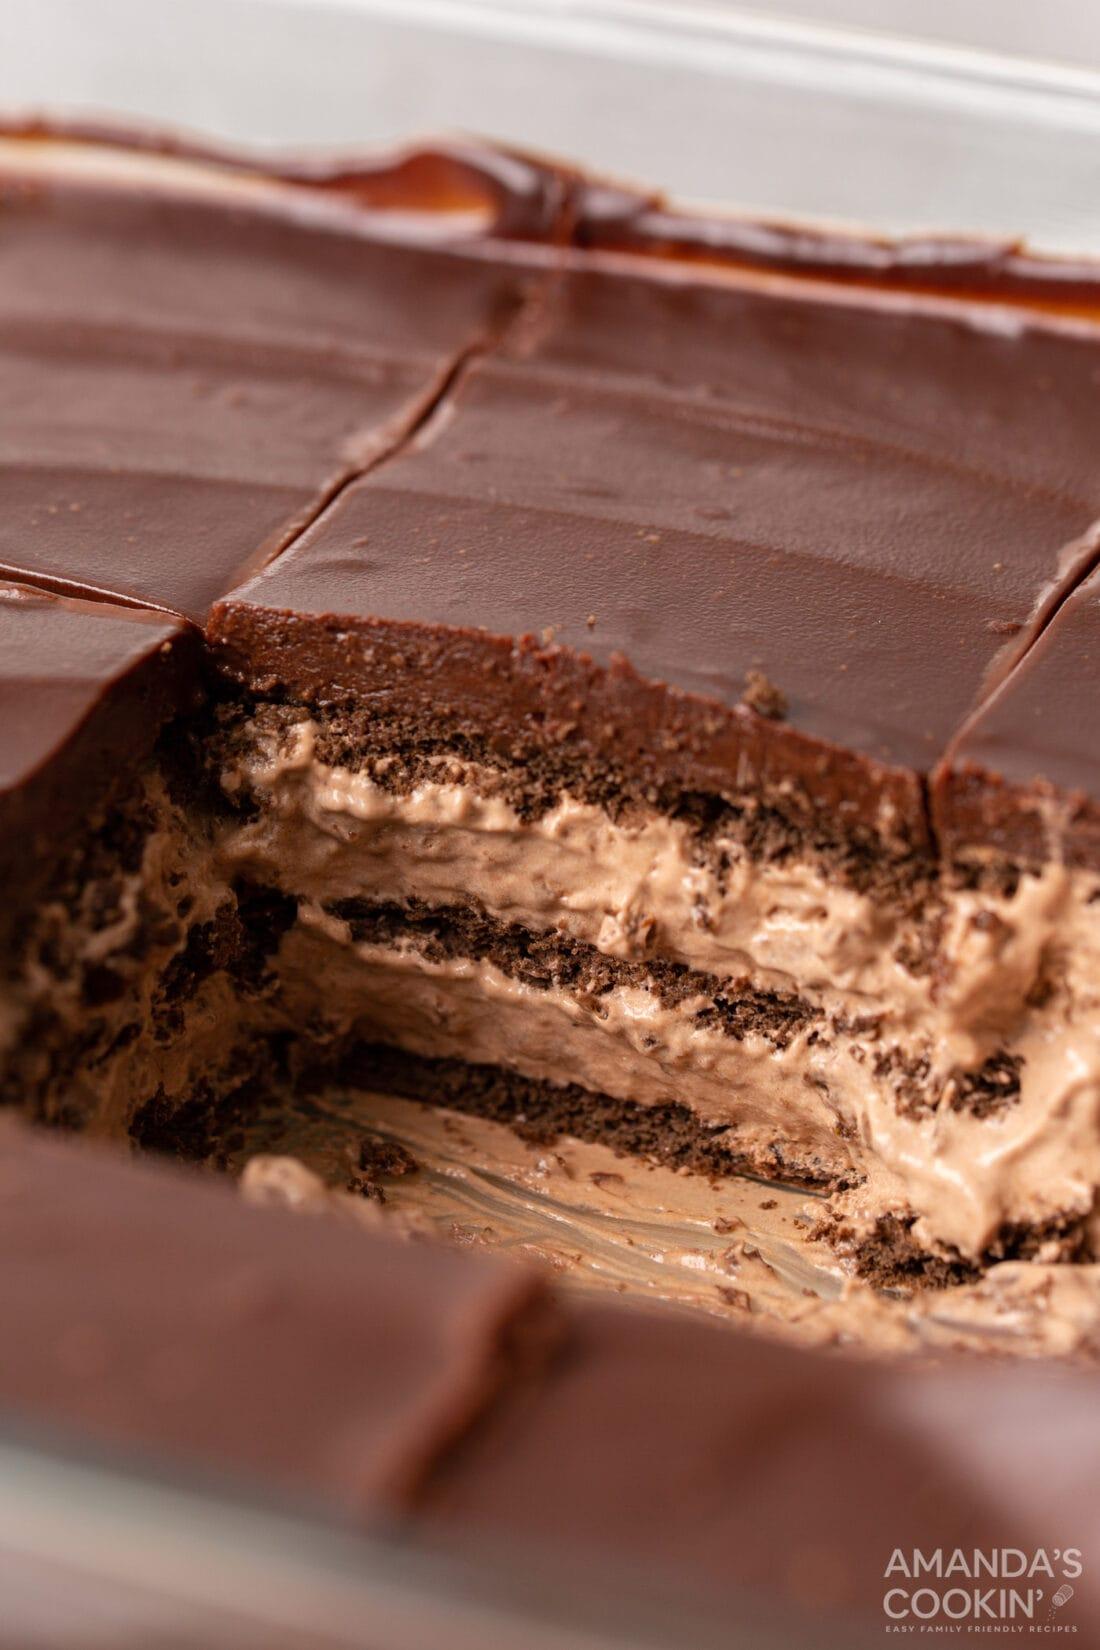 pan of Chocolate Icebox Cake